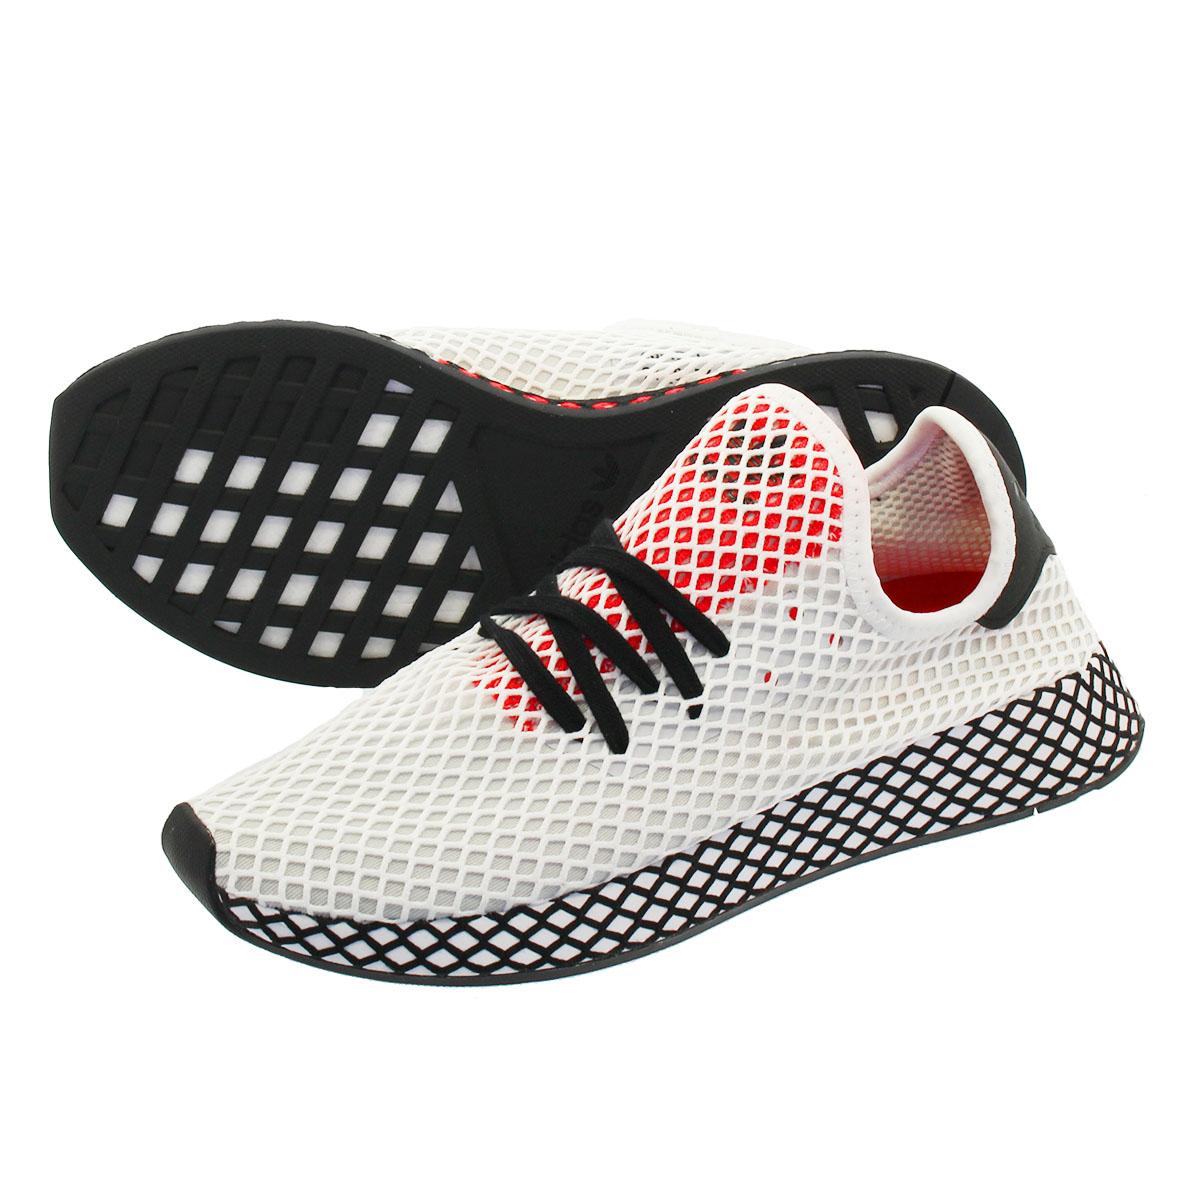 4def51da7 adidas DEERUPT RUNNER アディダスディーラプトランナー RUNNING WHITE CORE BLACK SHOCK RED  db2686